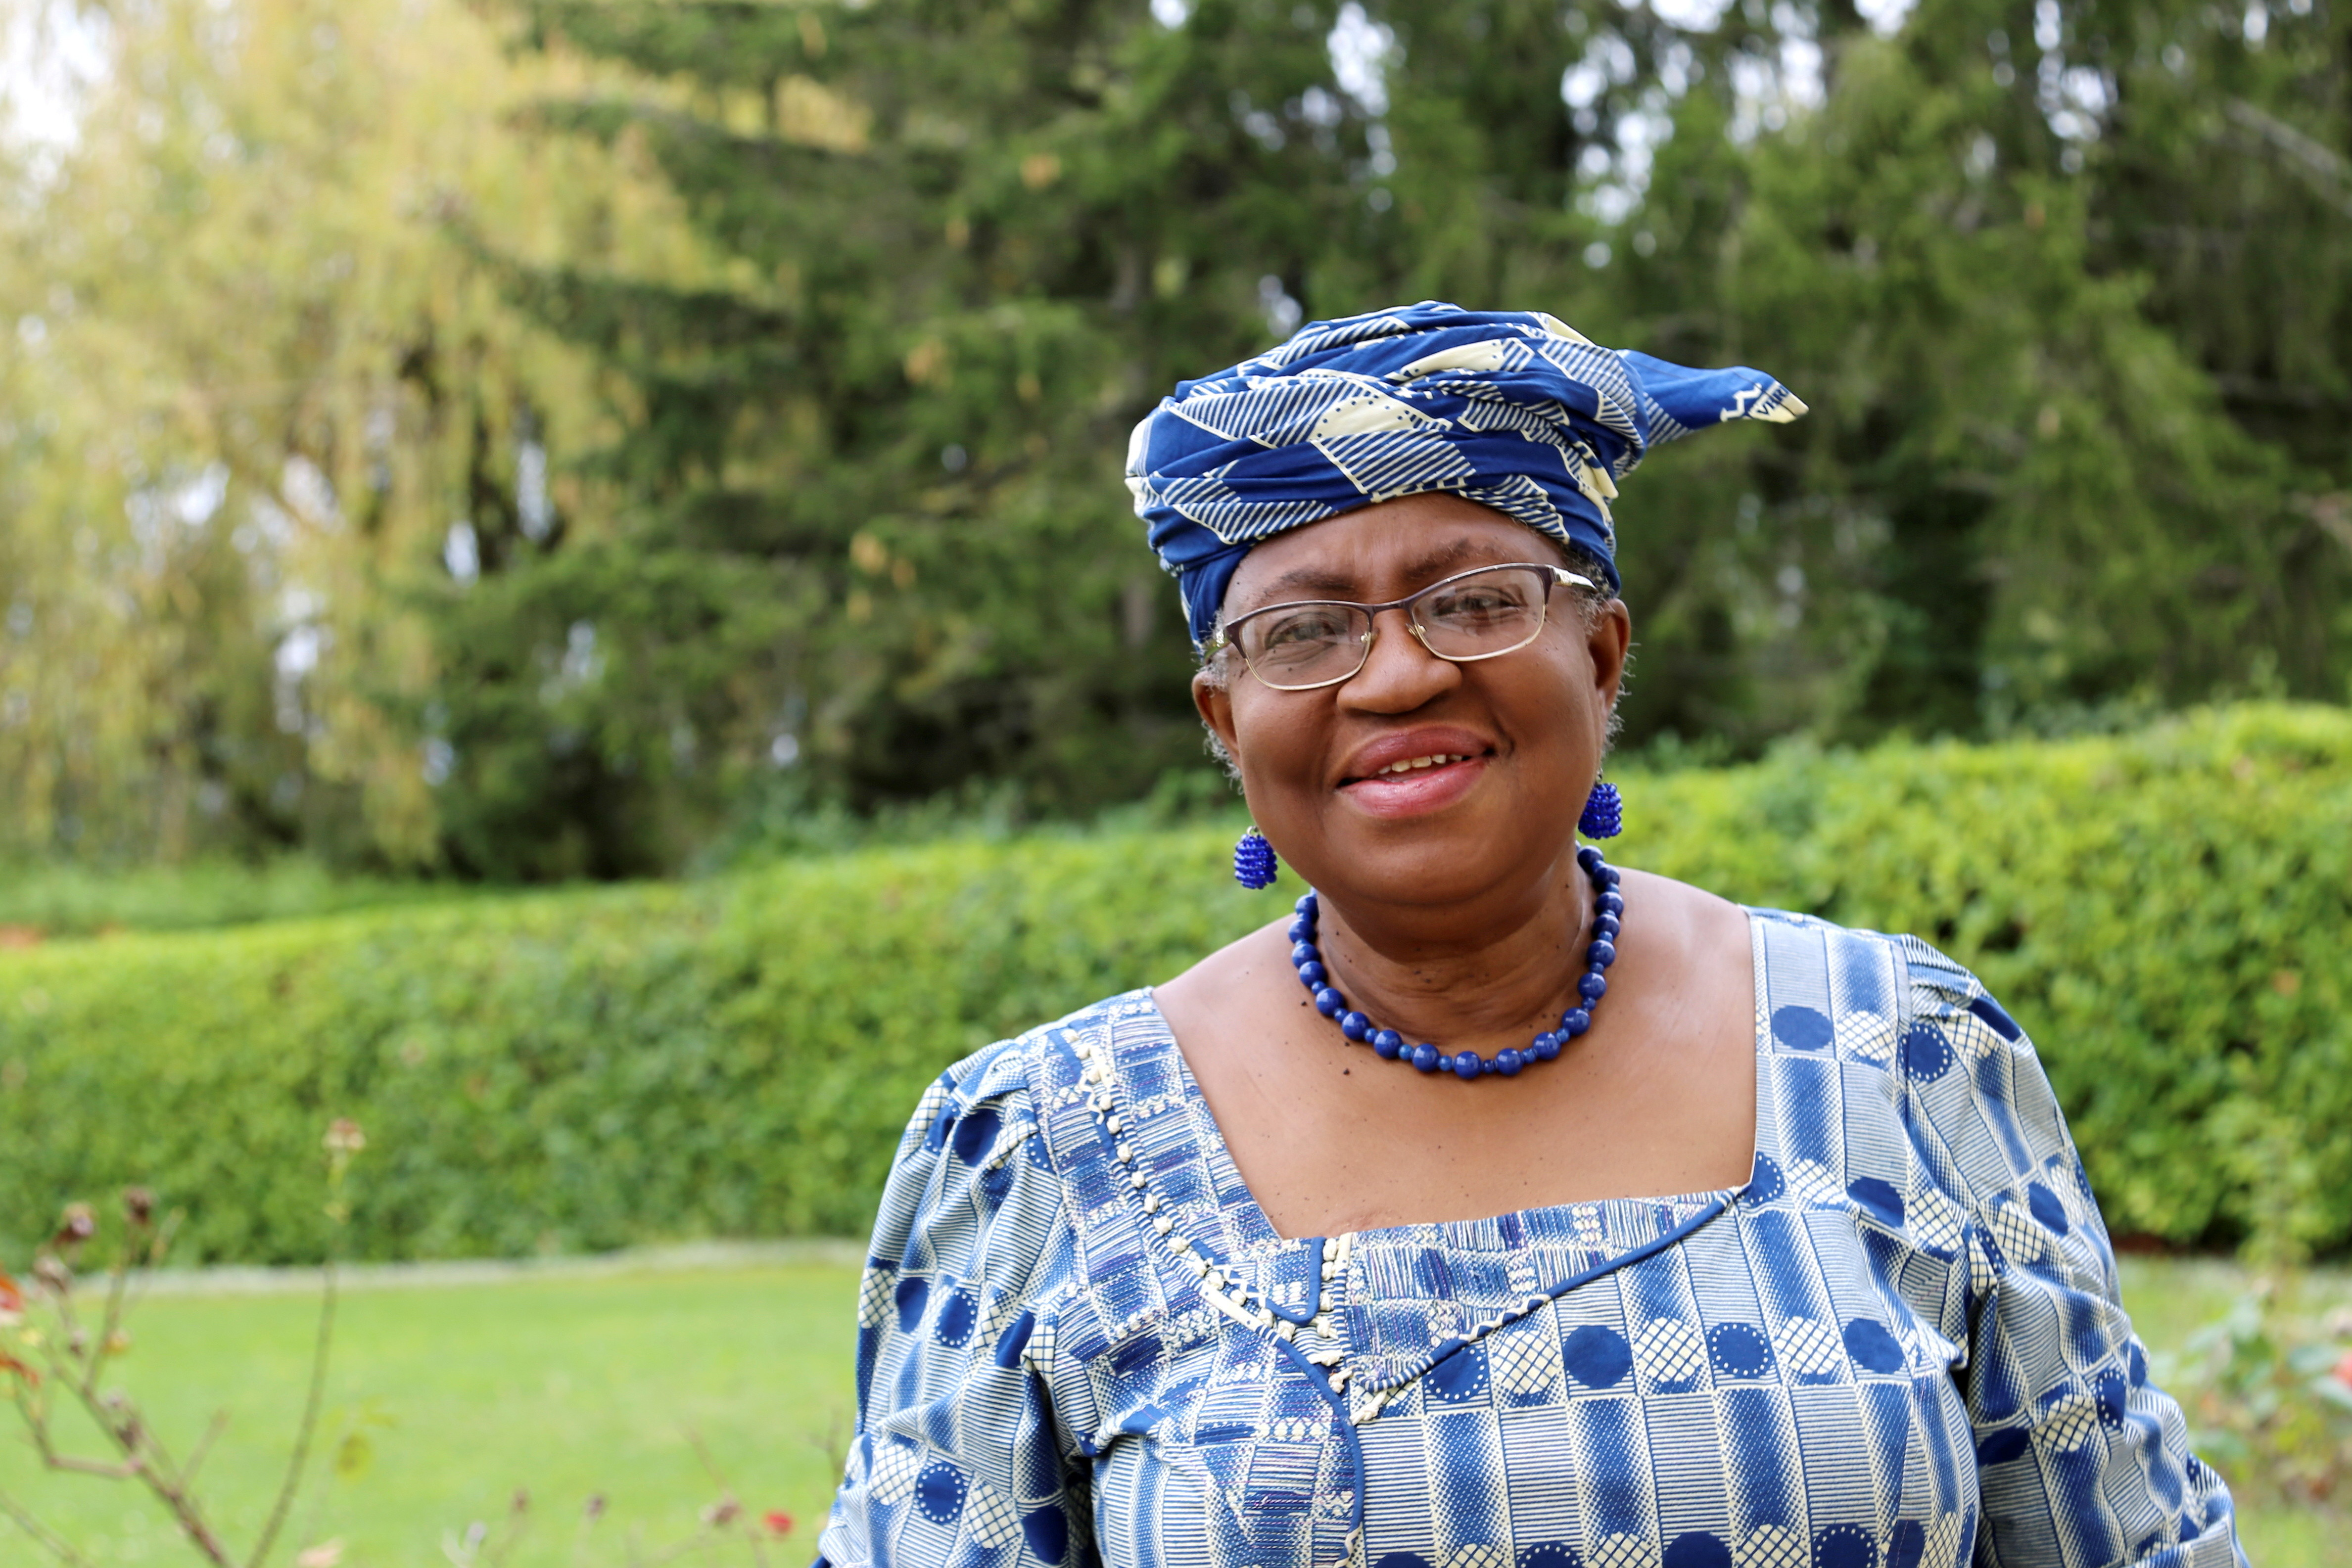 Ngozi Okonjo-Iweala poses outside a Nigerian diplomatic residence in Chambesy, near Geneva, Switzerland